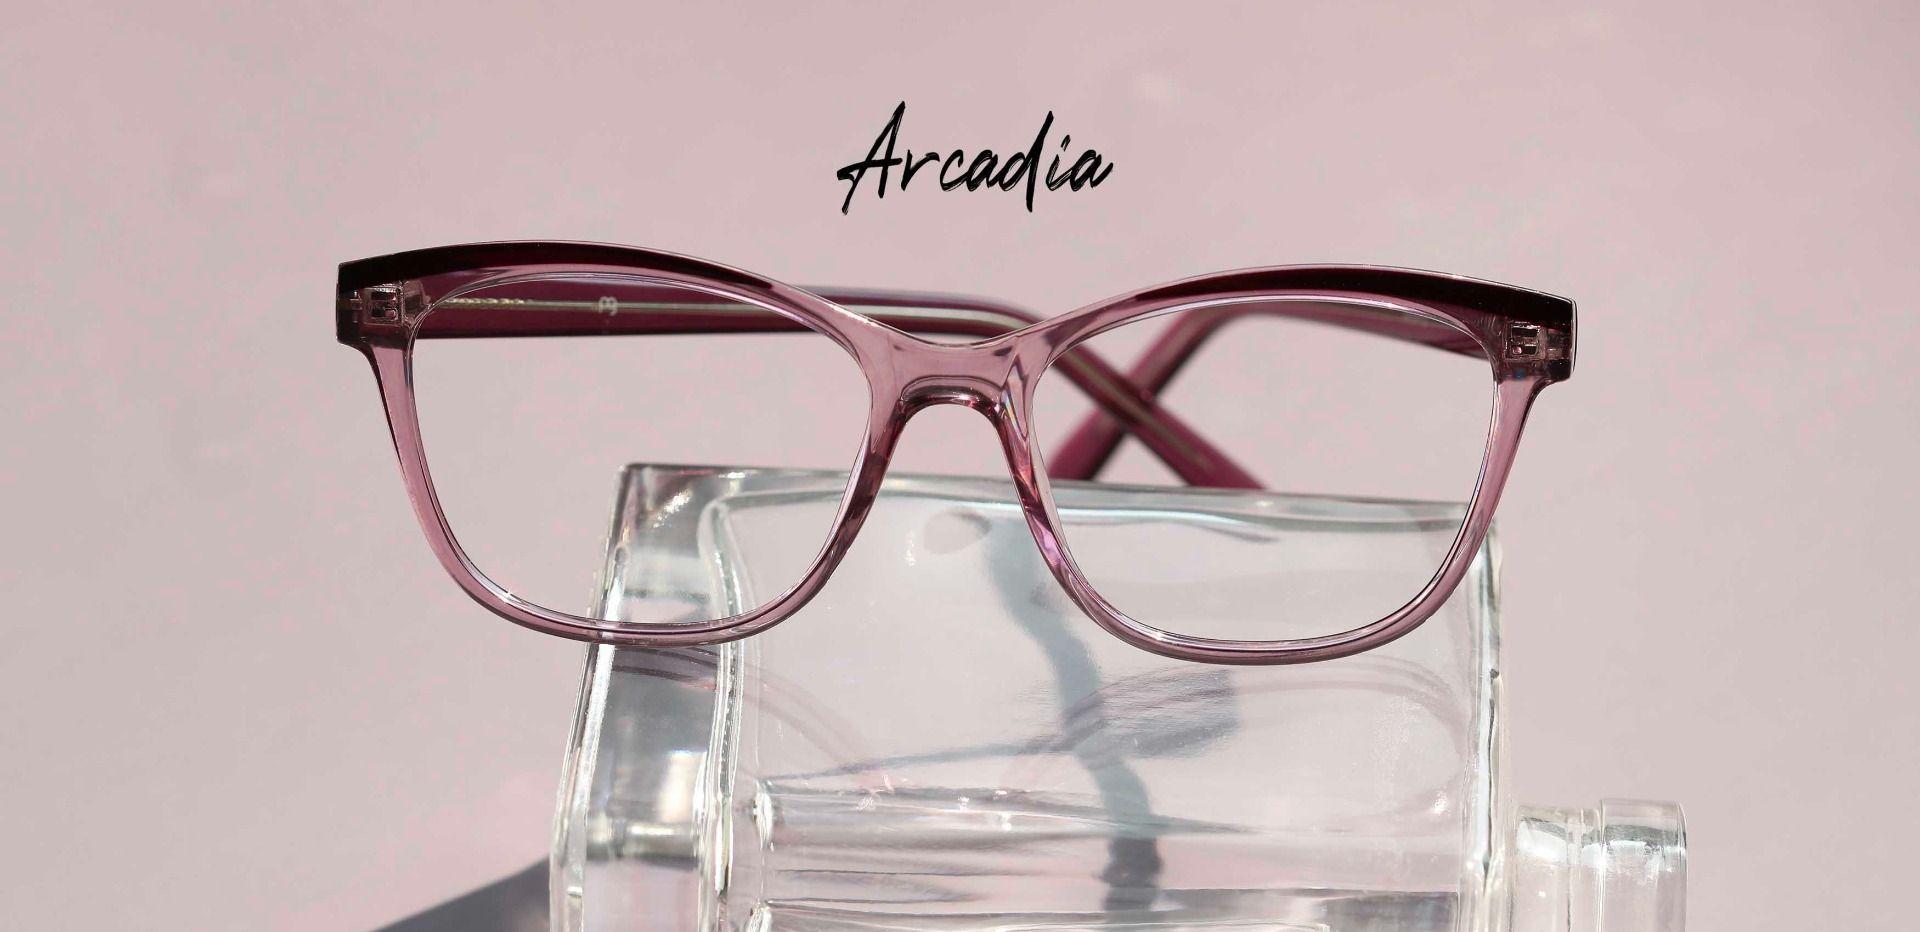 Arcadia Cat Eye Prescription Glasses - Purple